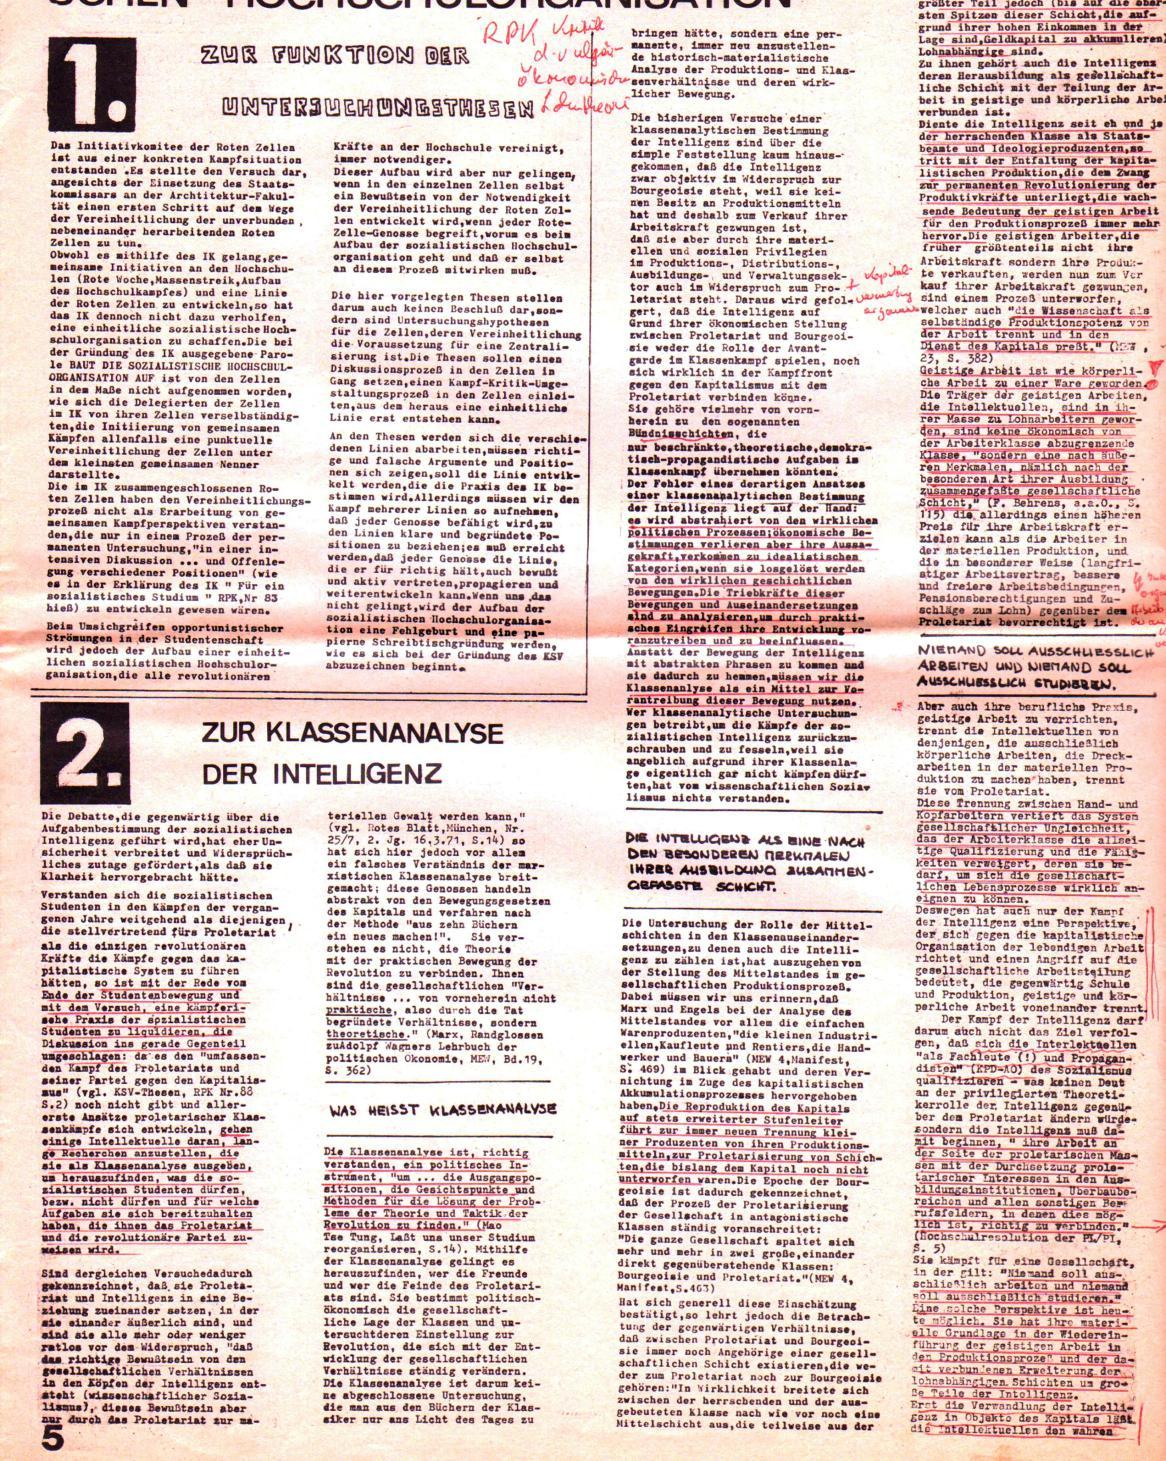 Berlin_Hochschulkampf_1971_07_05